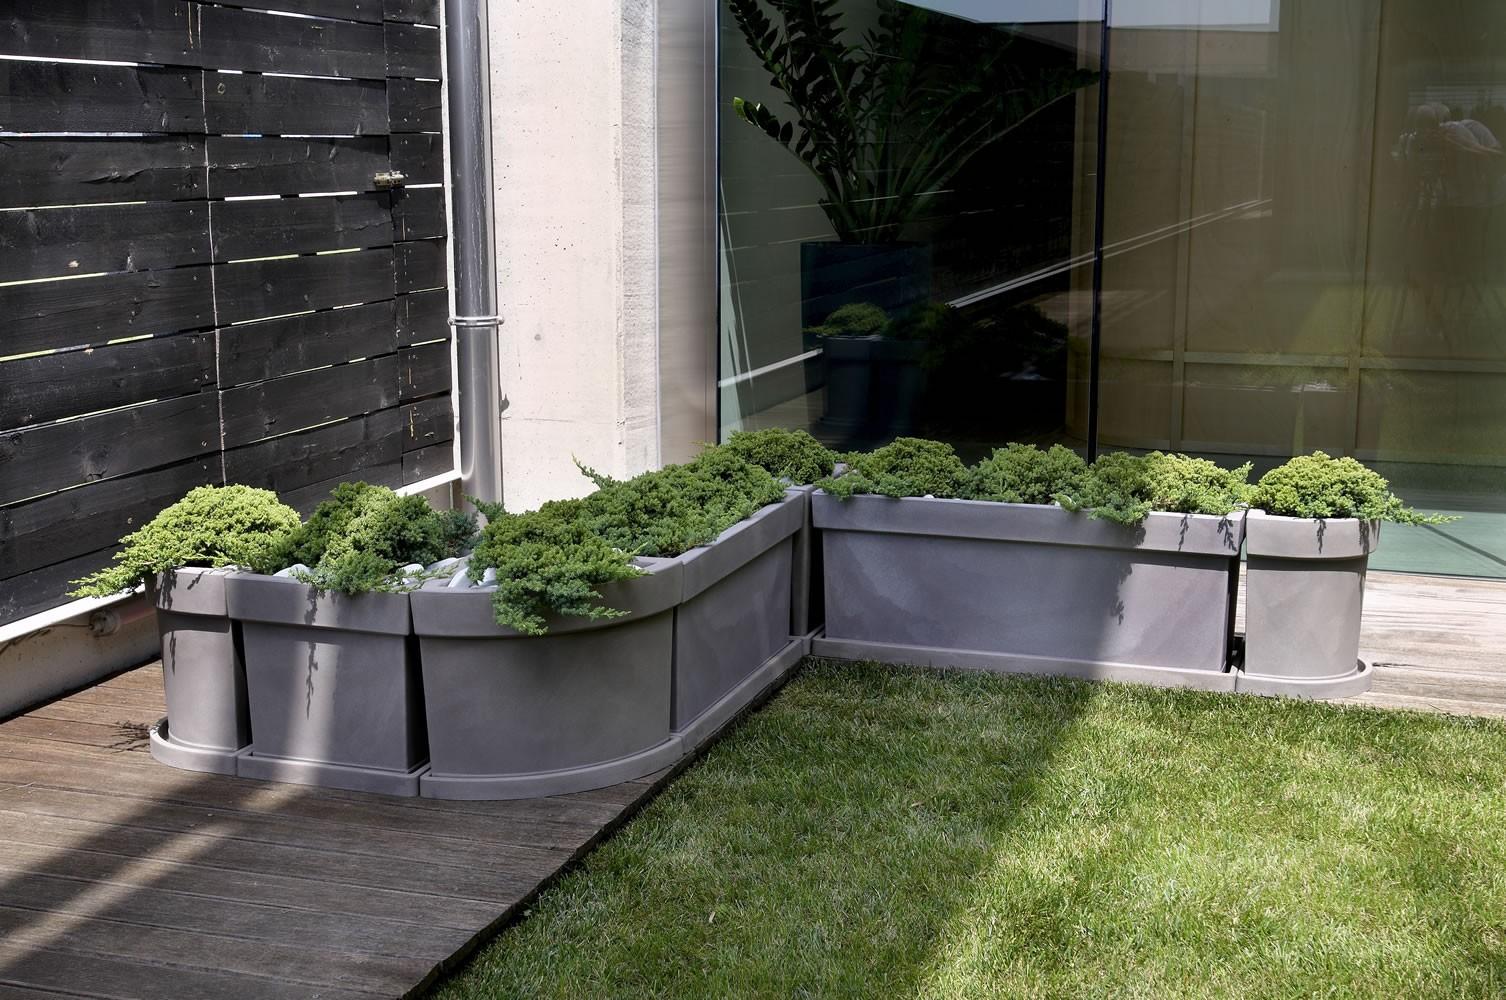 Vaso angolare per piante themis nicoli - Vasi da giardino ...